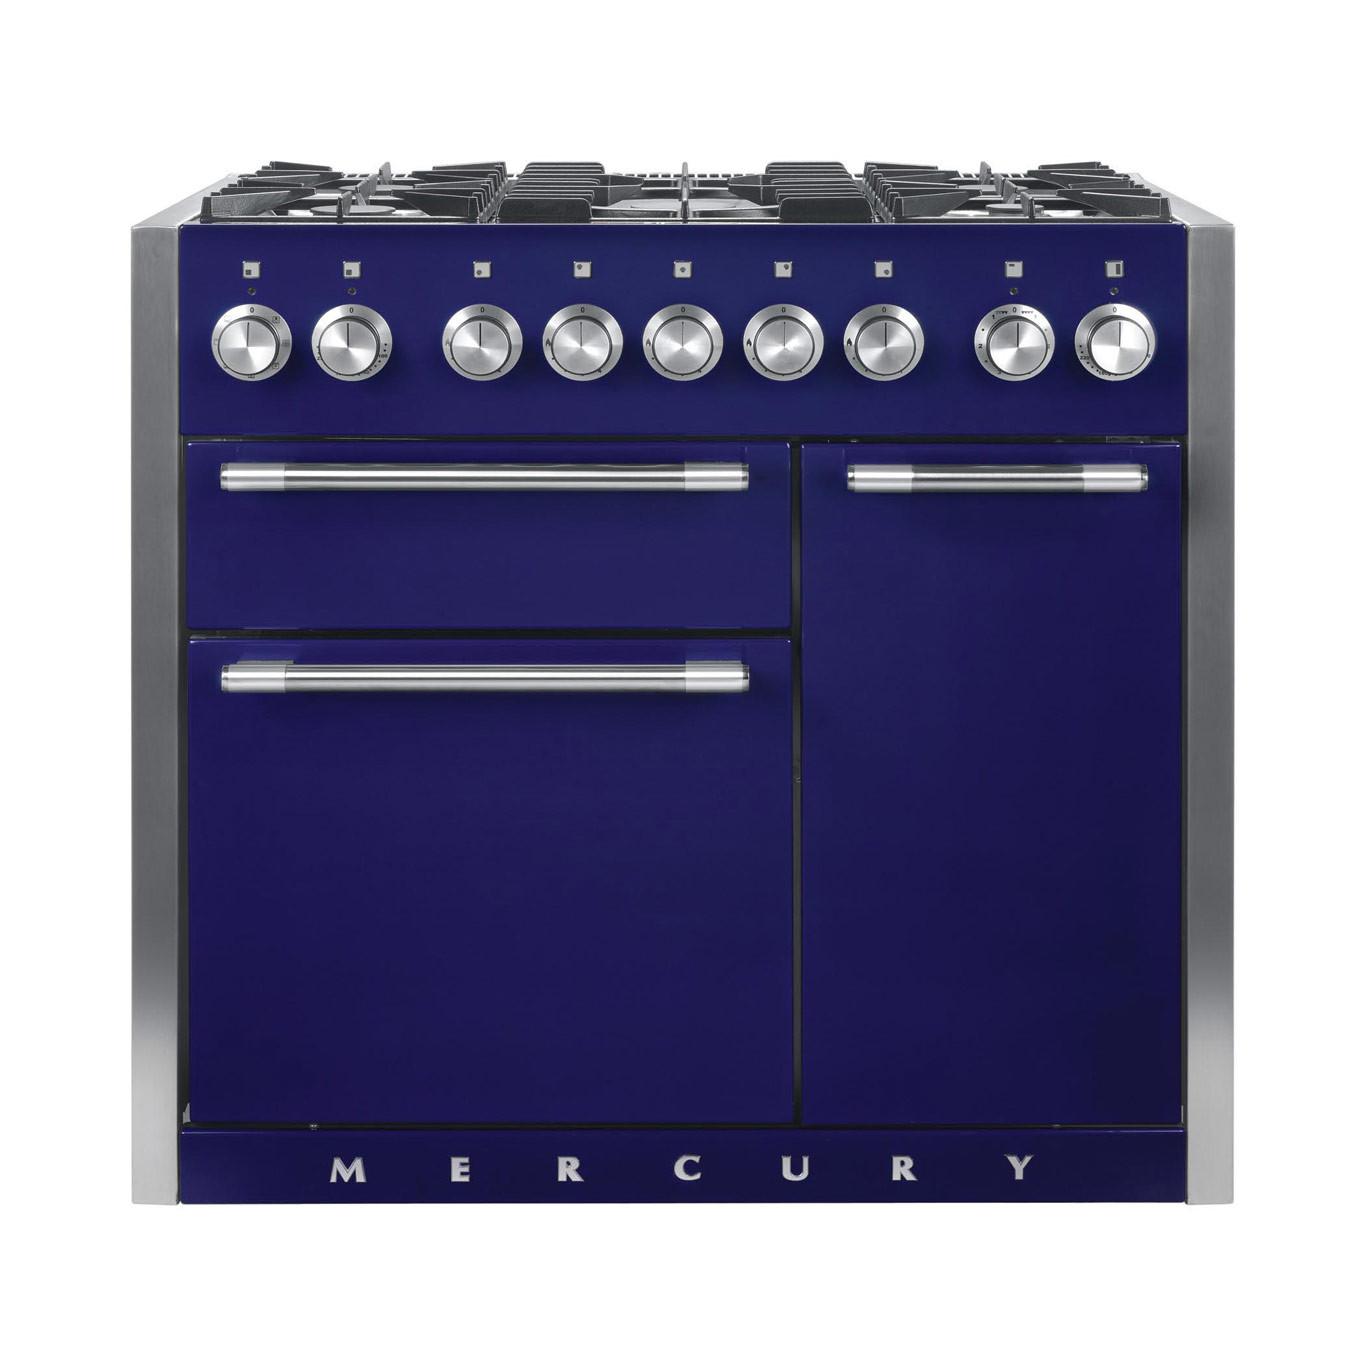 Mercury MCY1000DF Dual Fuel Blueberry Range Cooker